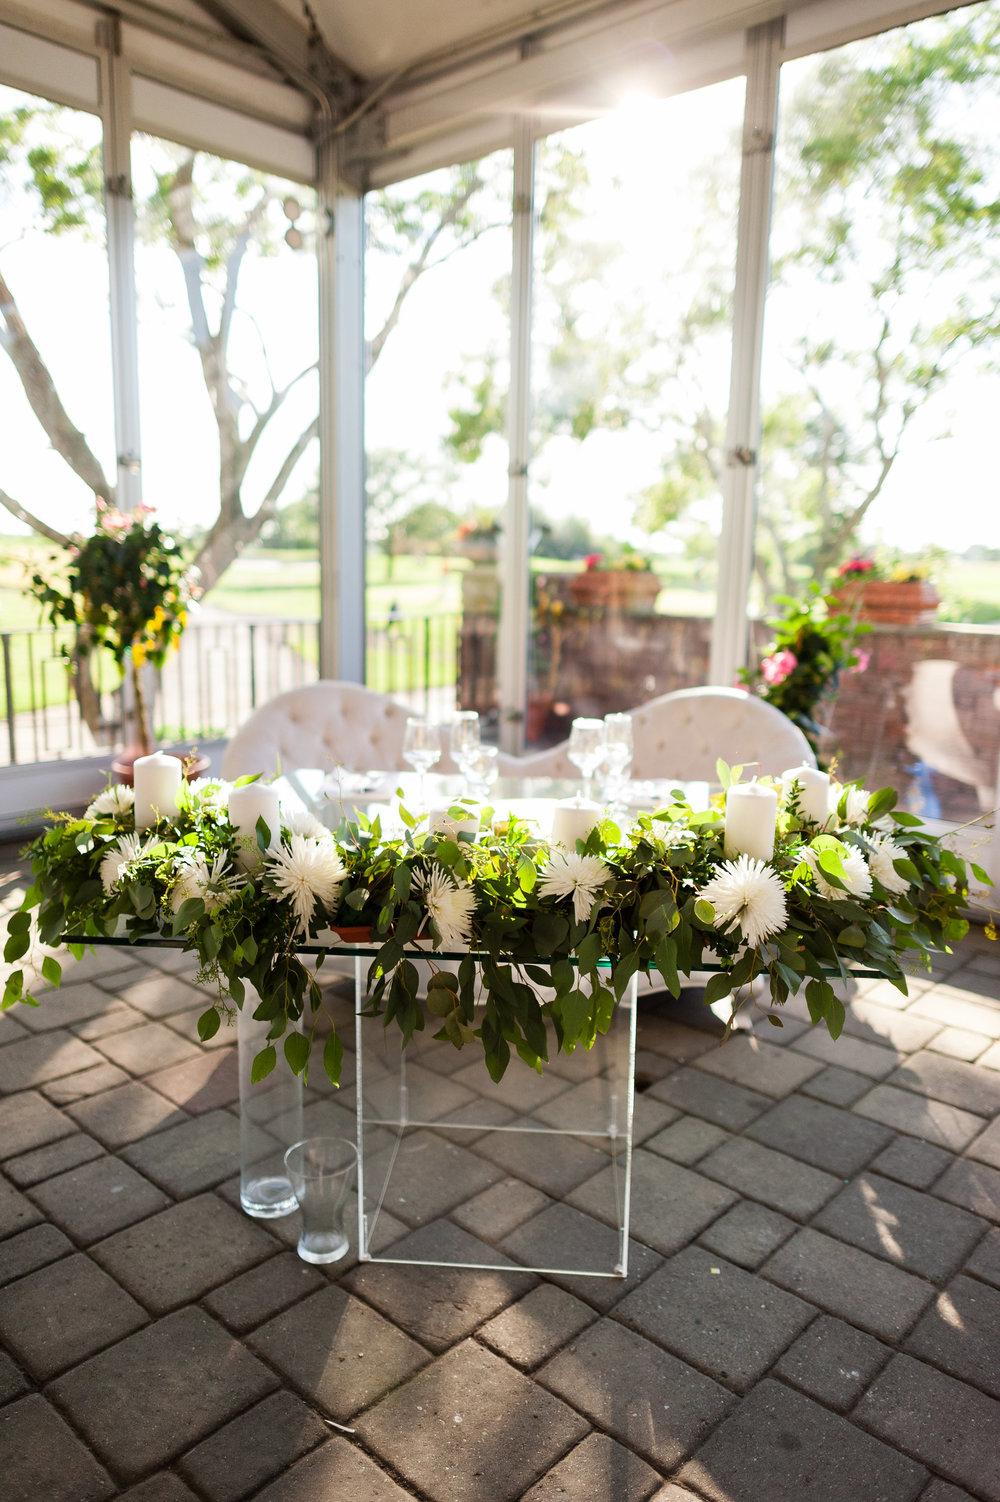 Melissa_Marlon_Trinidad_wedding_Petronella_Photography_462.jpg